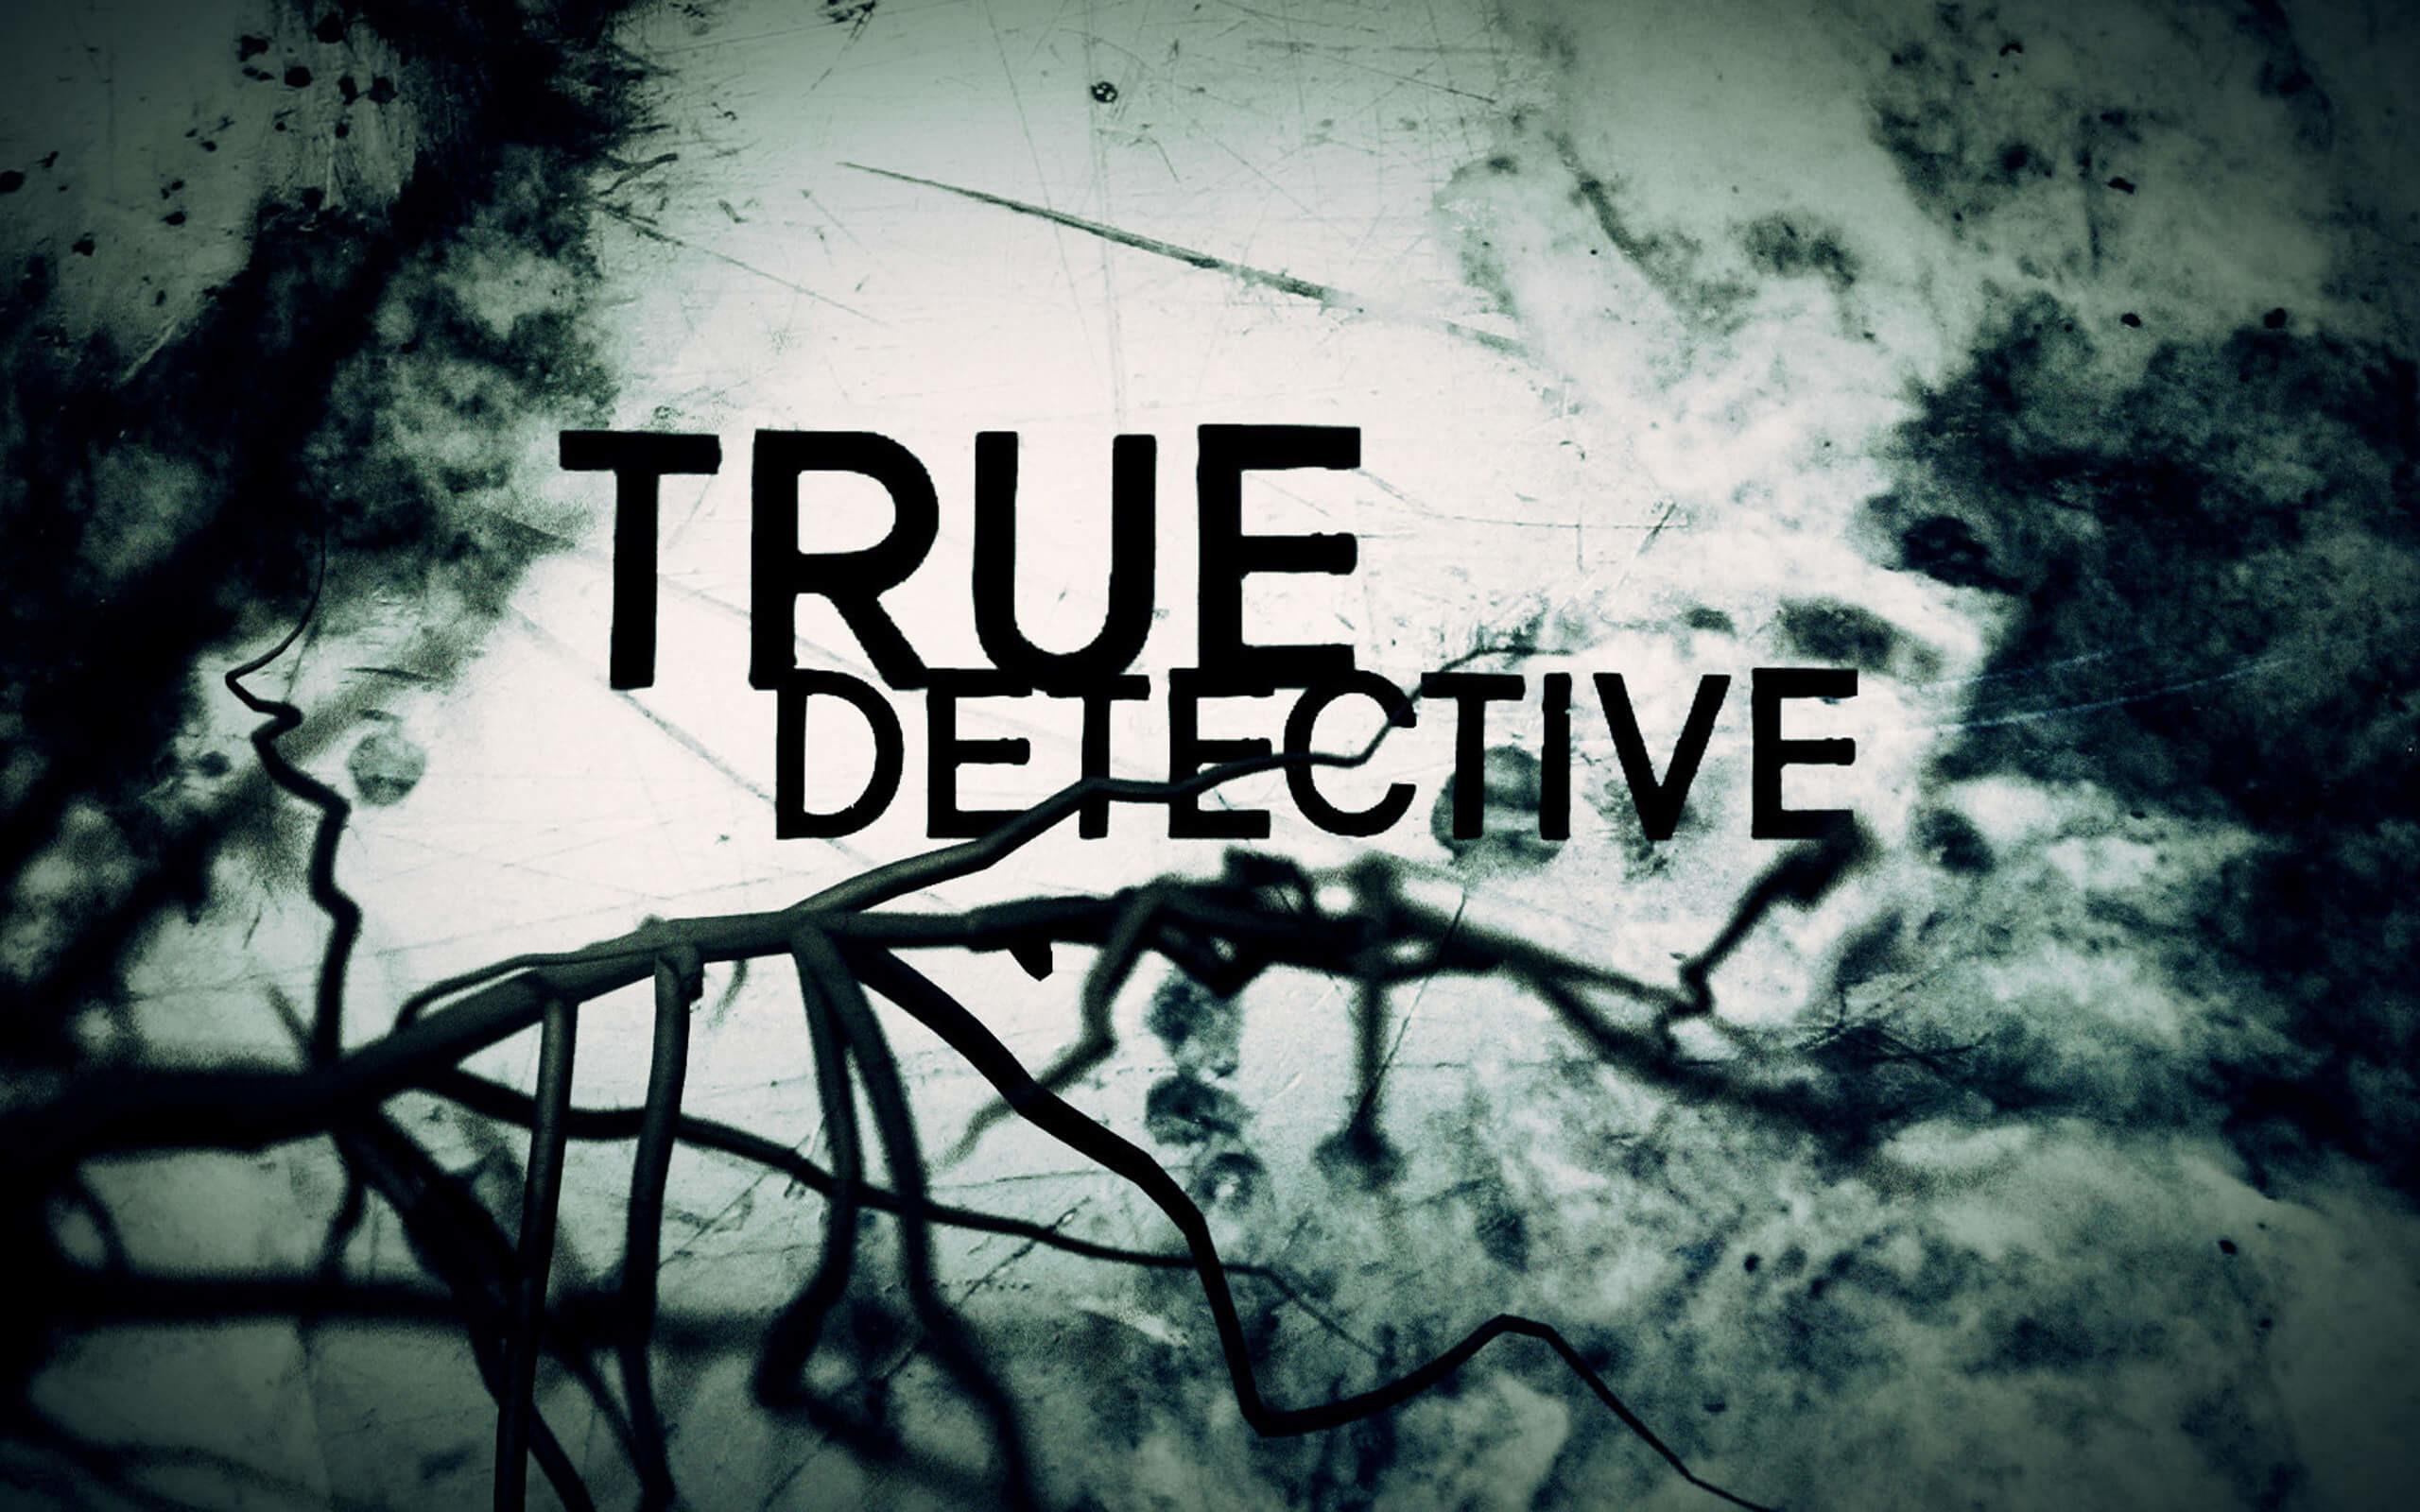 true detective wallpapers 81 images